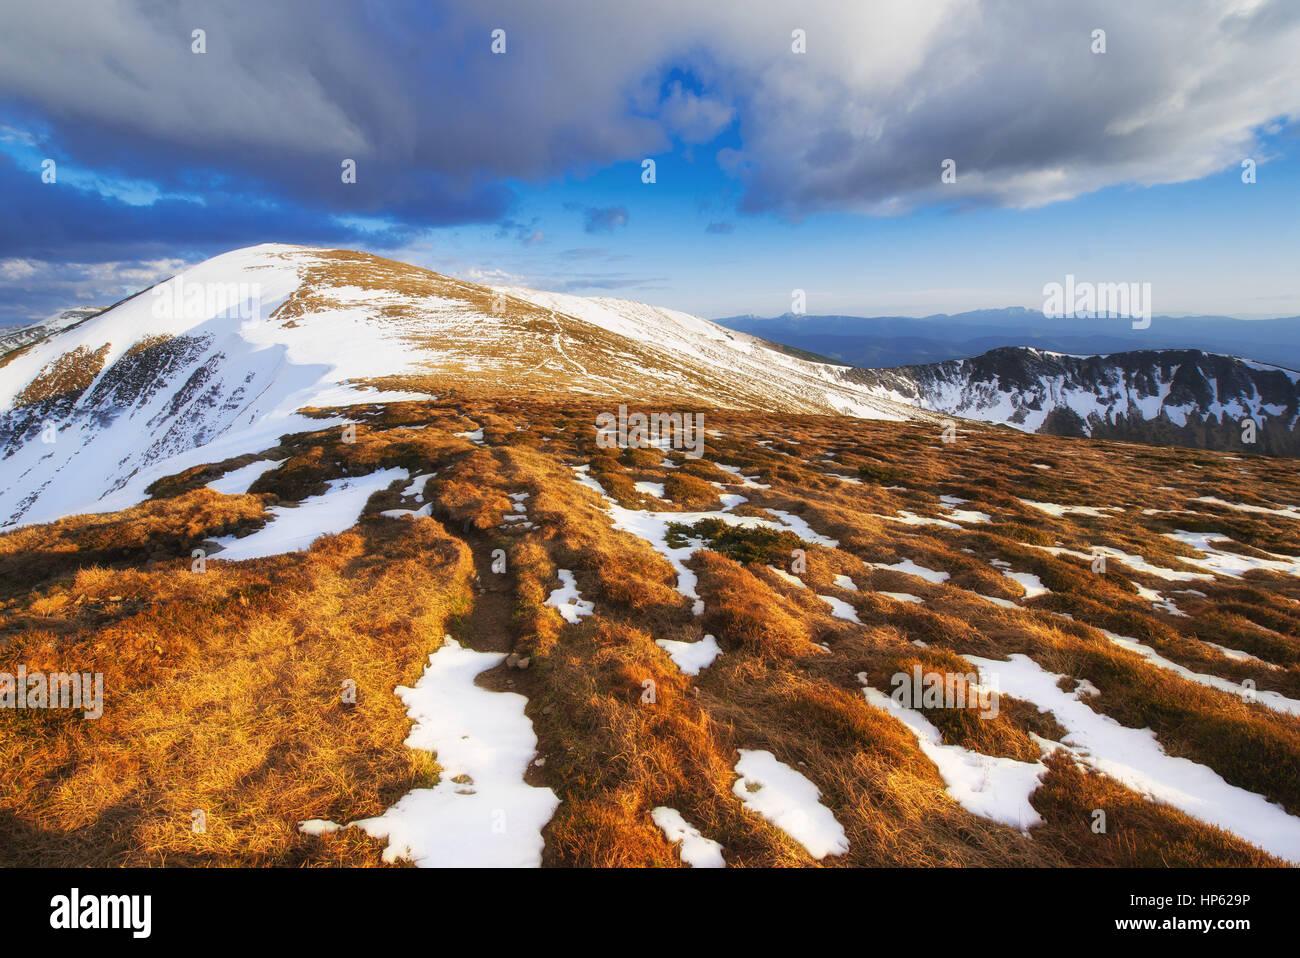 Misterioso paesaggio invernale maestose montagne Immagini Stock